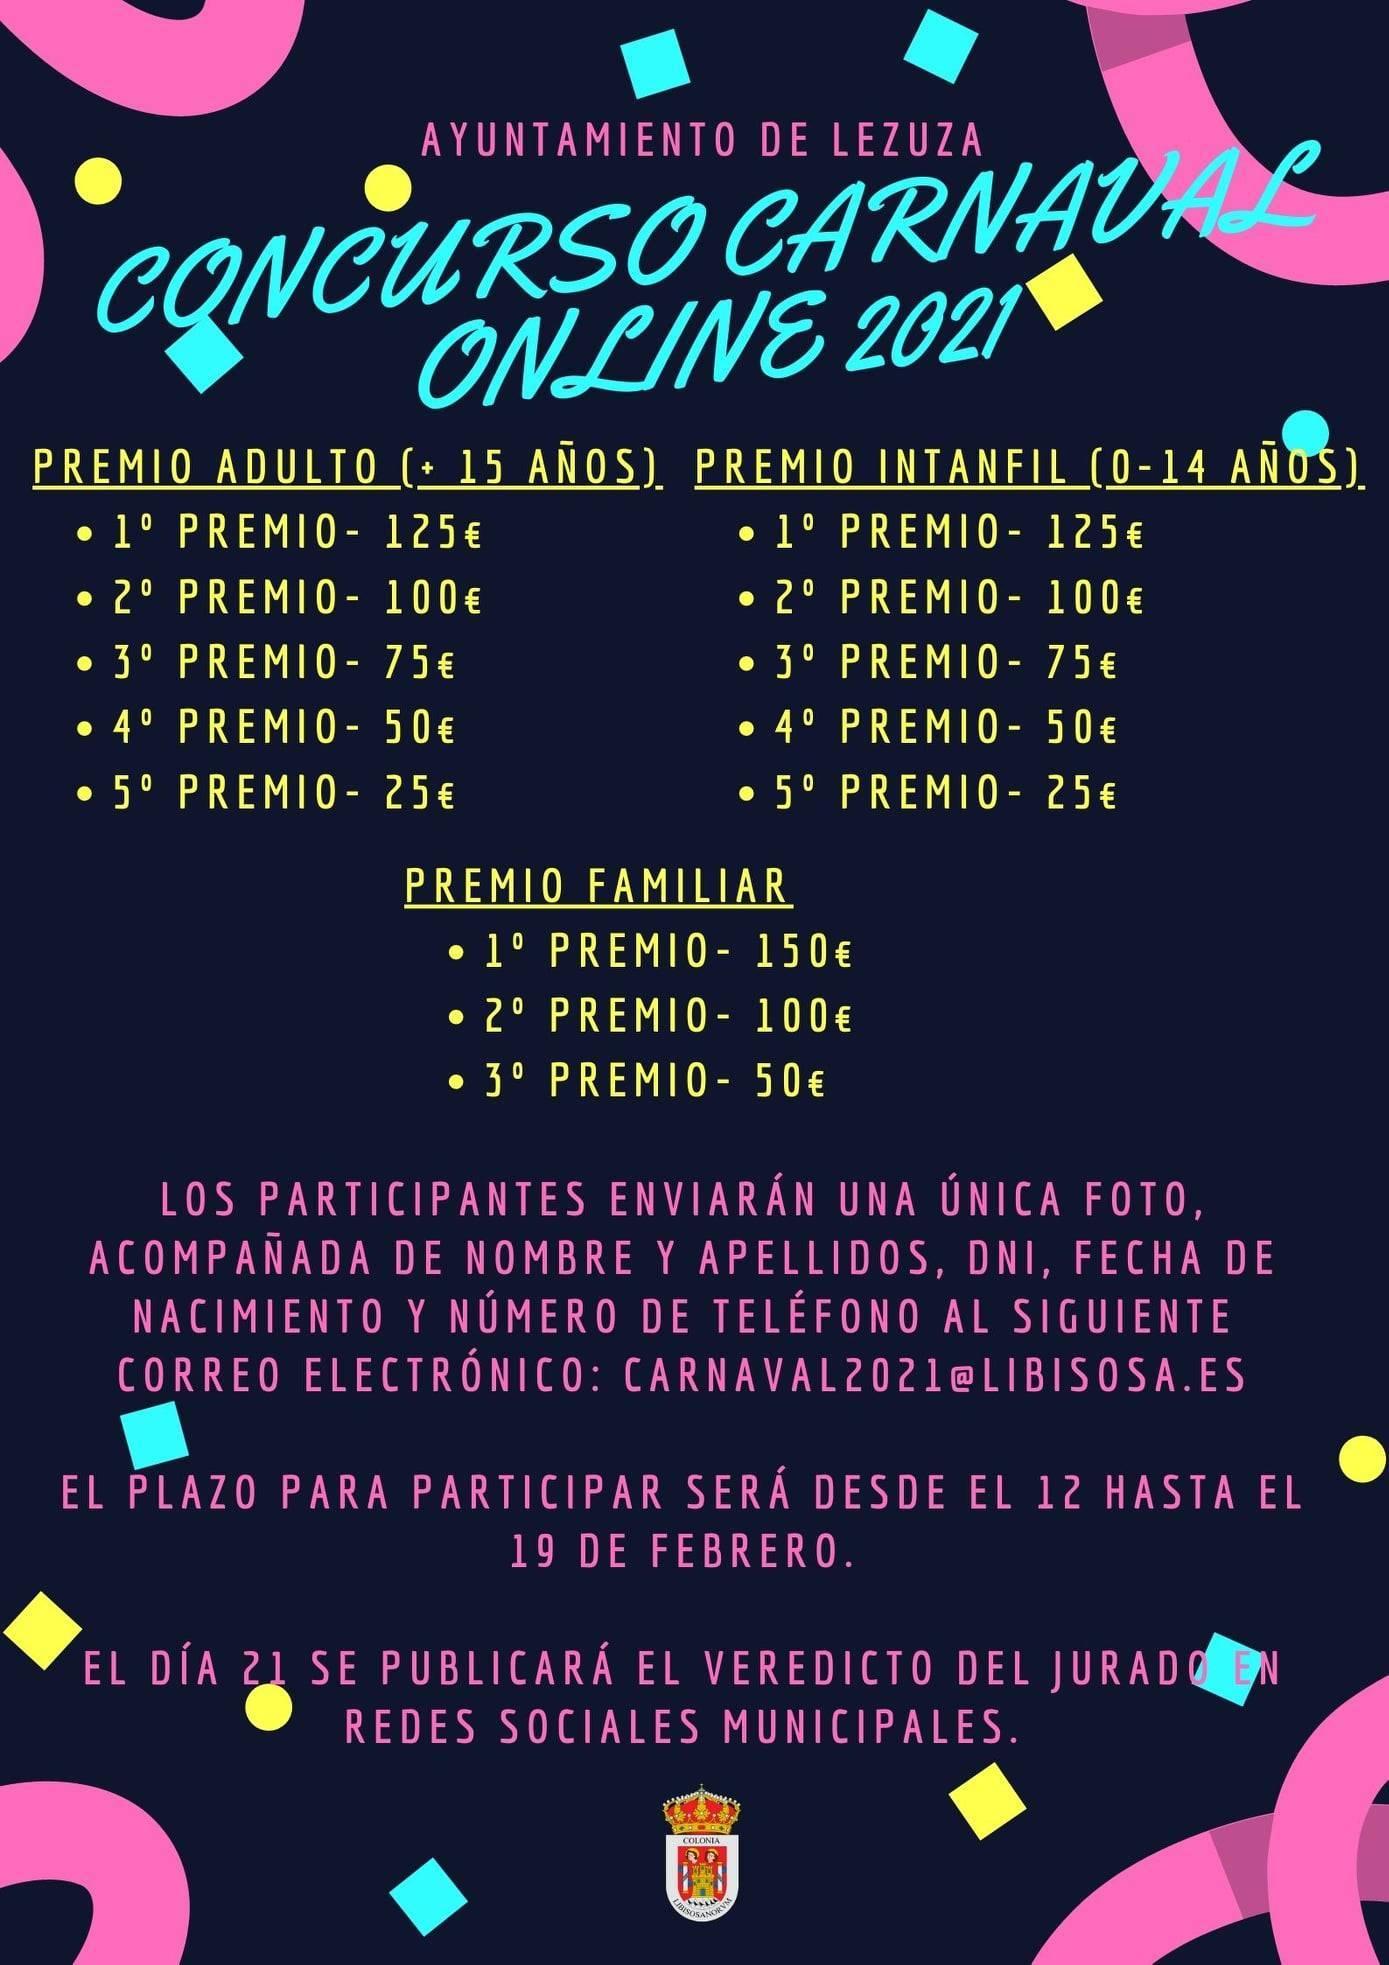 Concurso de Carnaval online (2021) - Lezuza (Albacete)